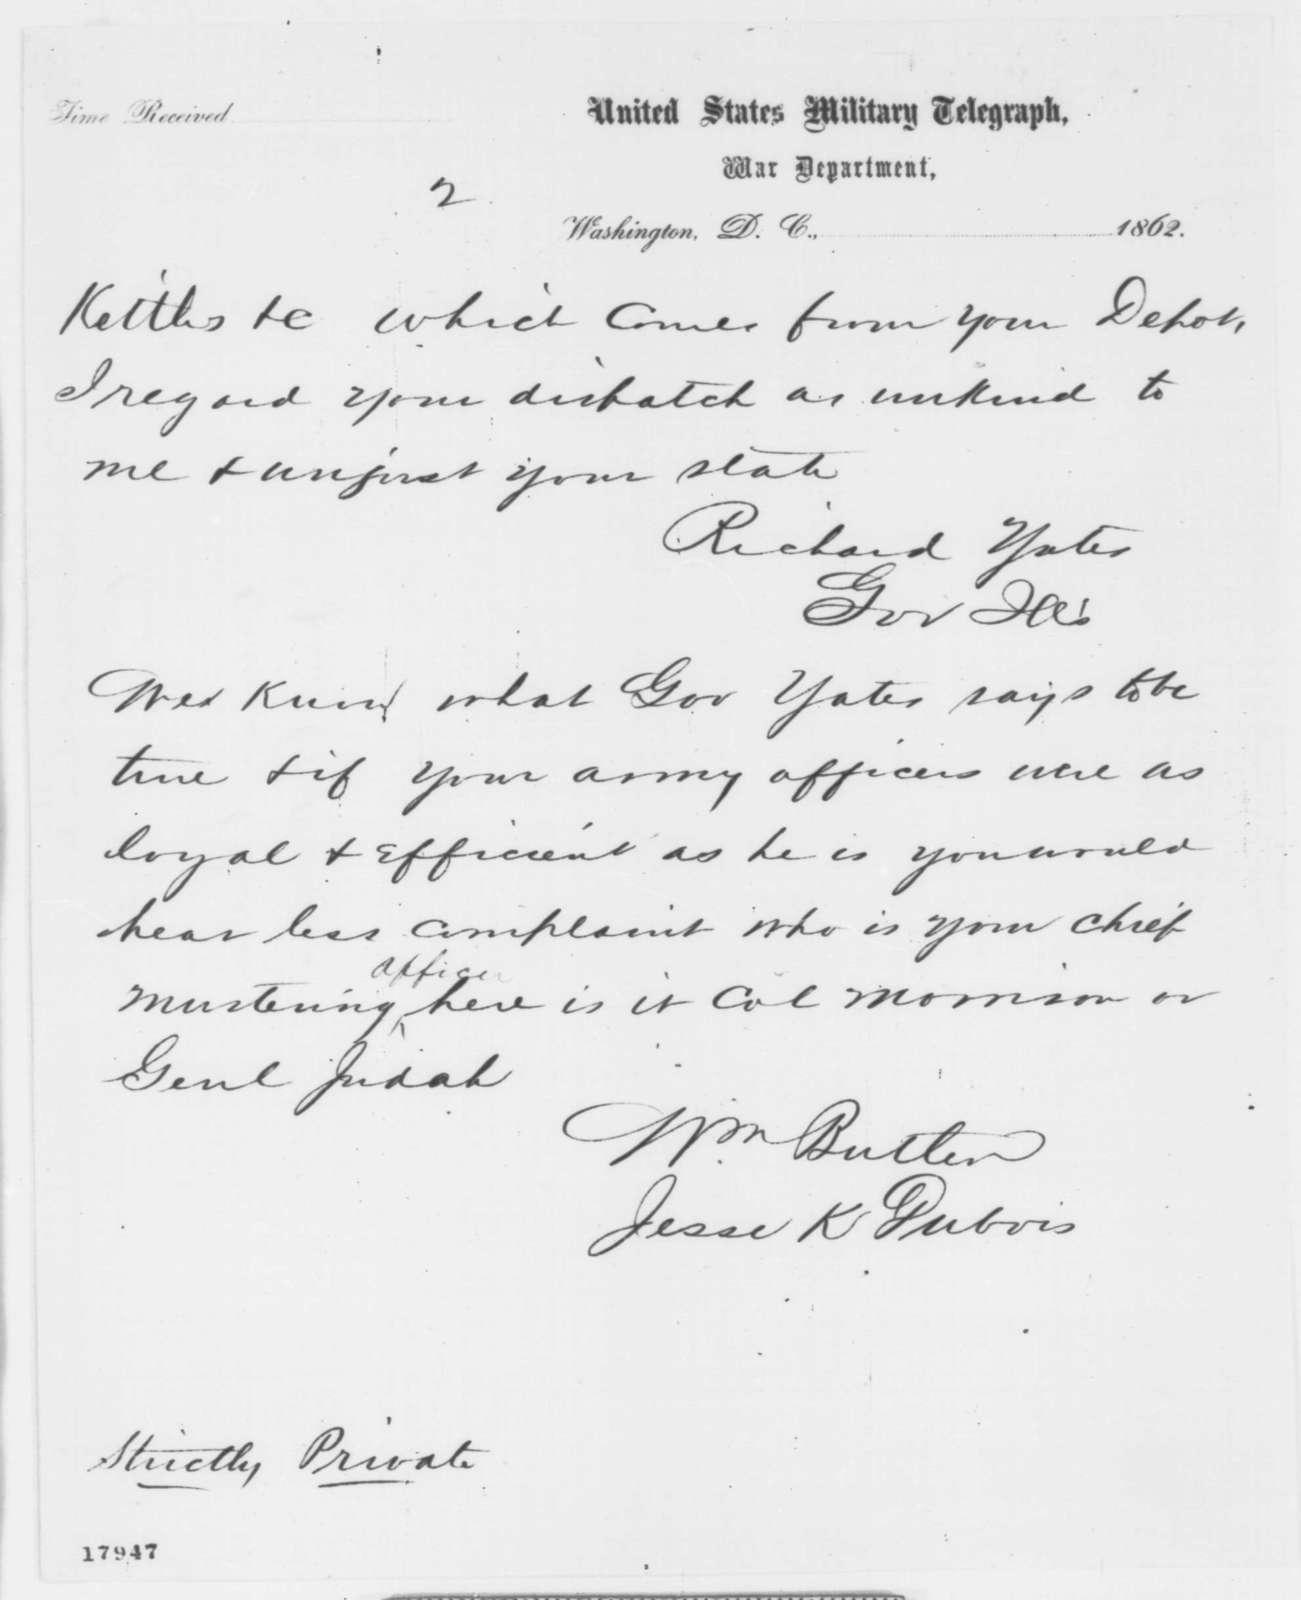 Jesse K. Dubois, William Butler, and Richard Yates to Abraham Lincoln, Saturday, August 23, 1862  (Telegram concerning military affairs)